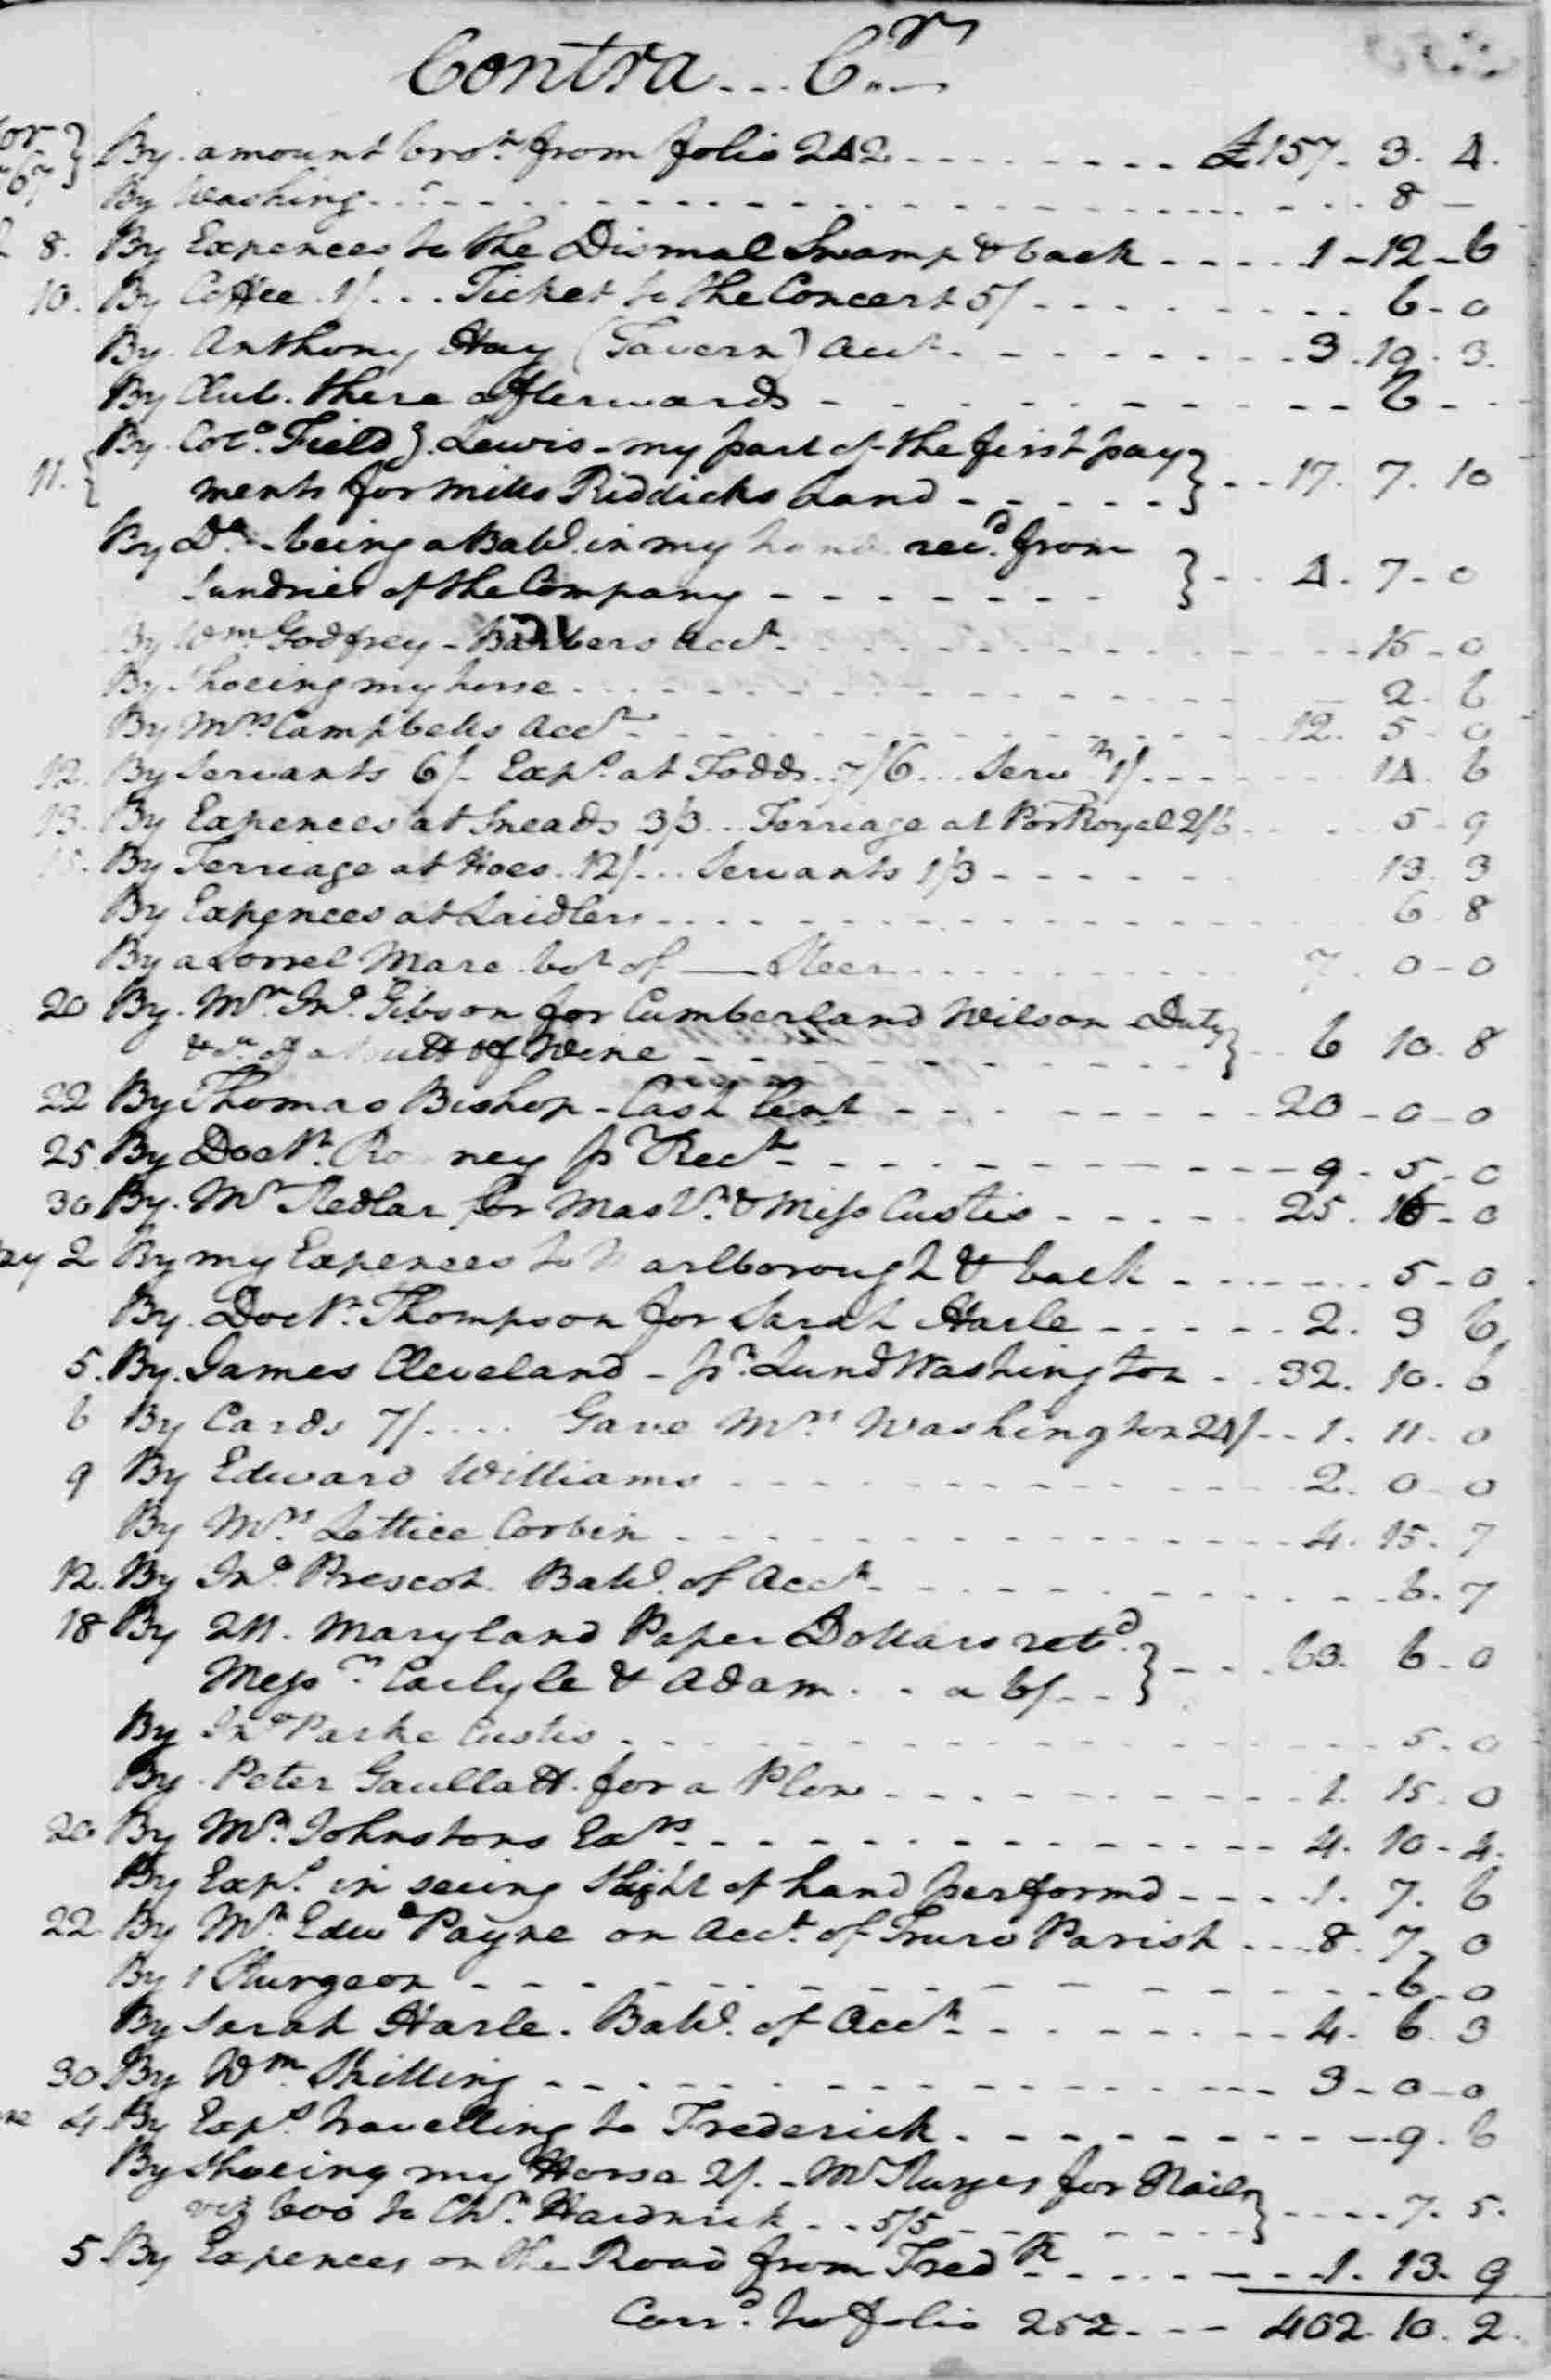 Ledger A, folio 249, right side